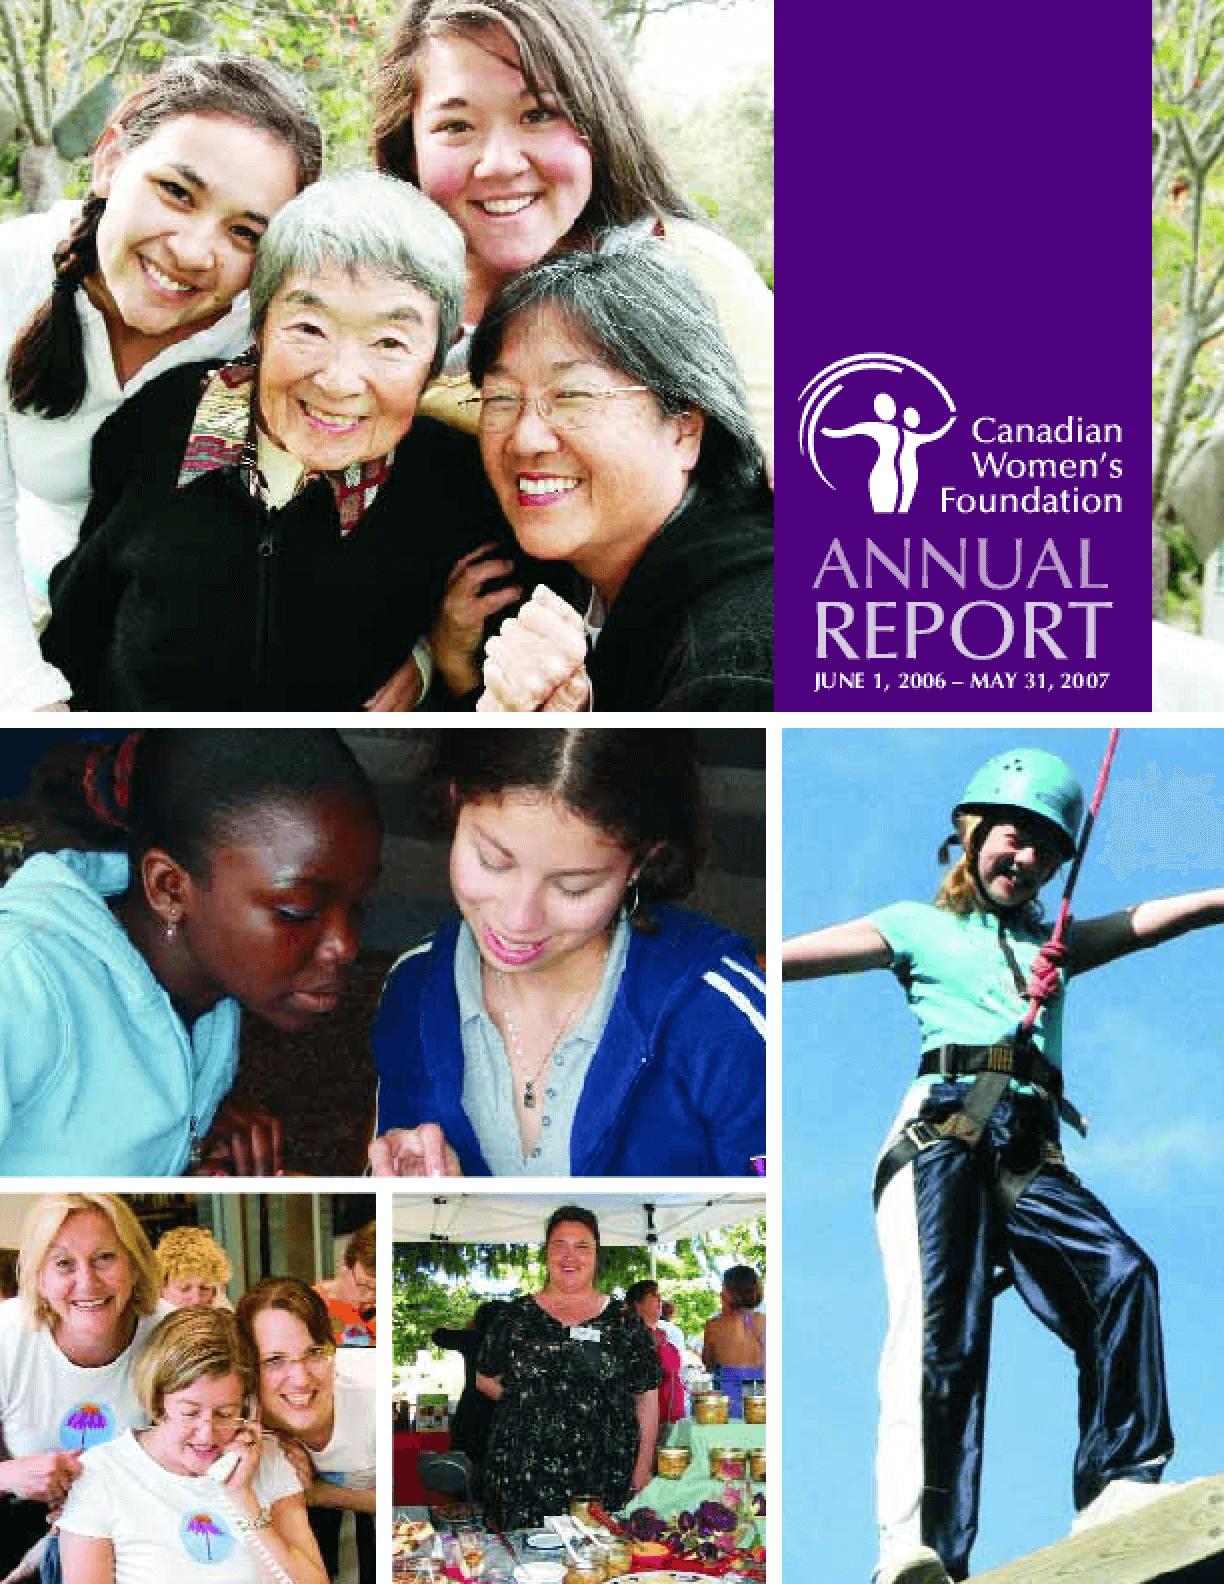 Annual Report 2006/2007